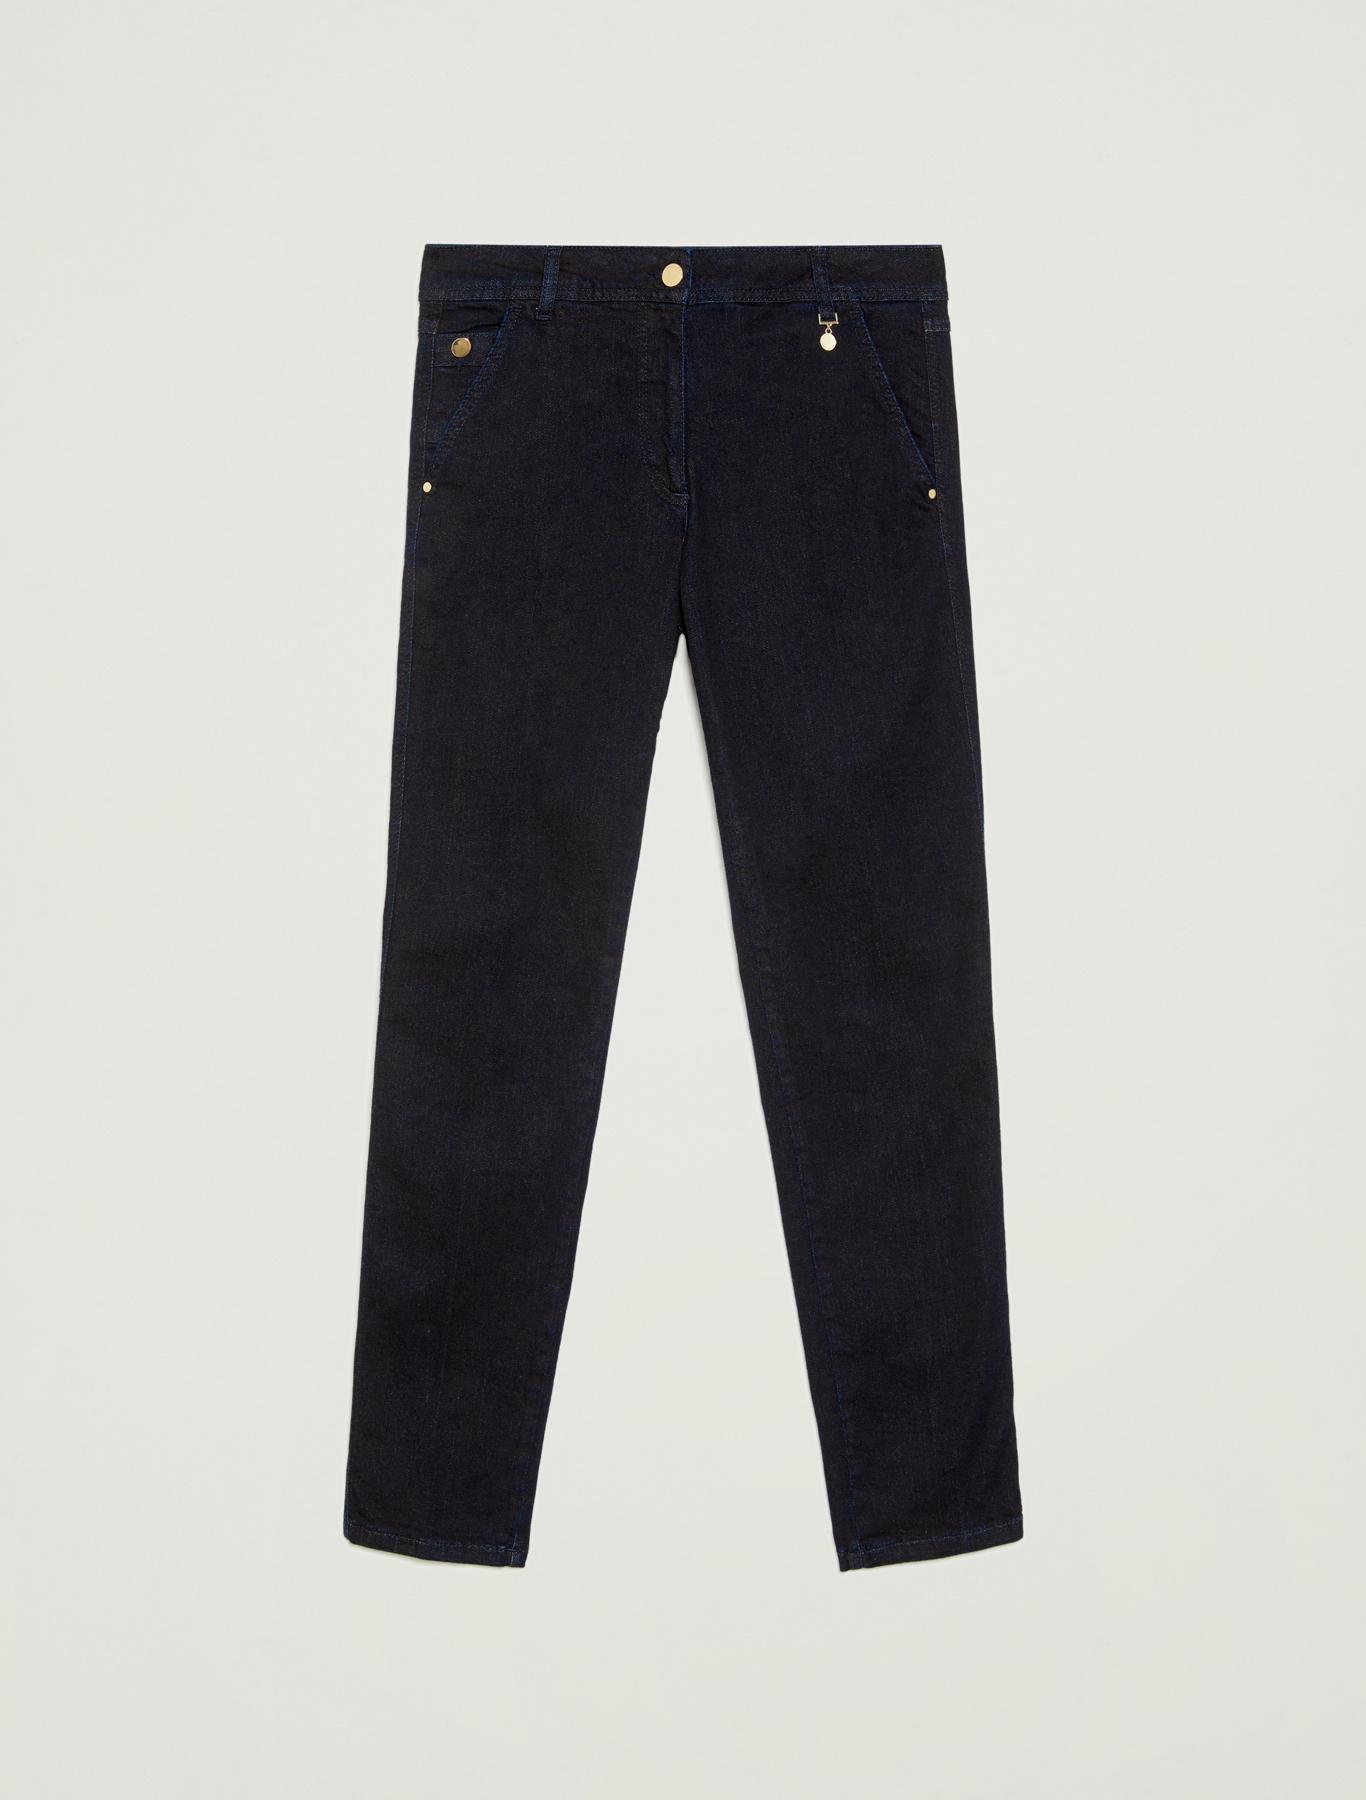 Dark blue slim-fit jeans - midnight blue - pennyblack